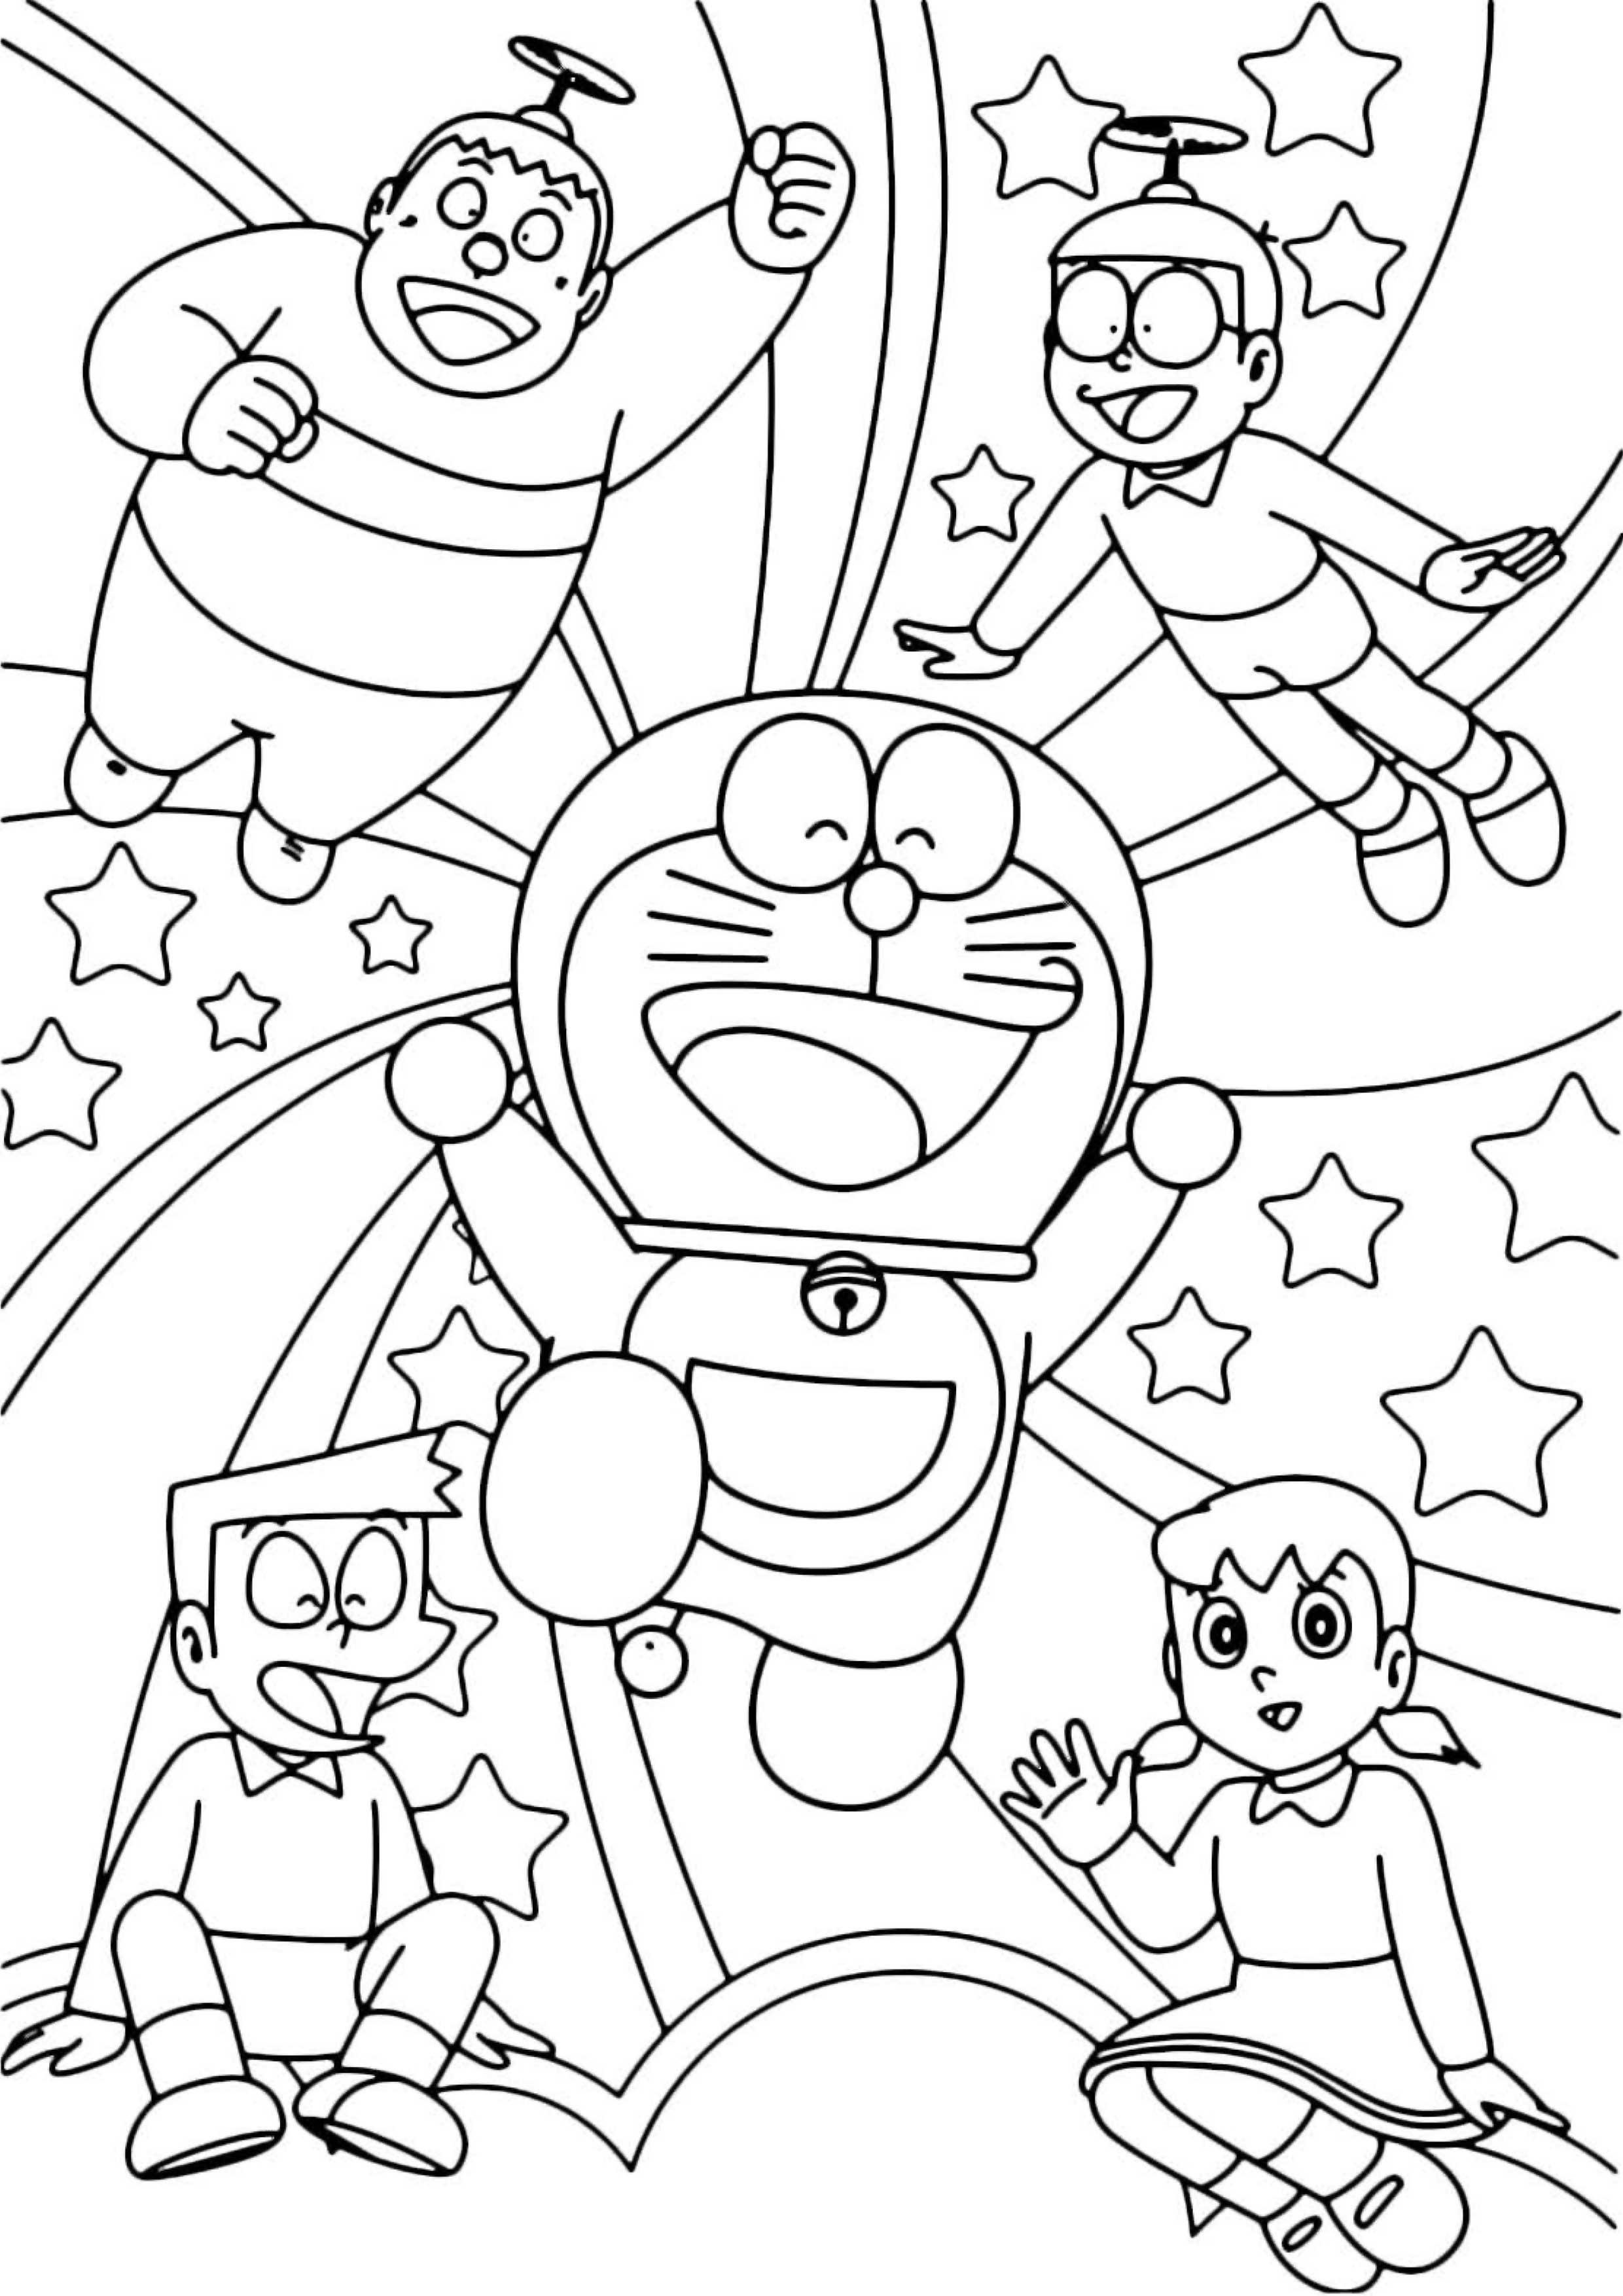 Doraemon-13